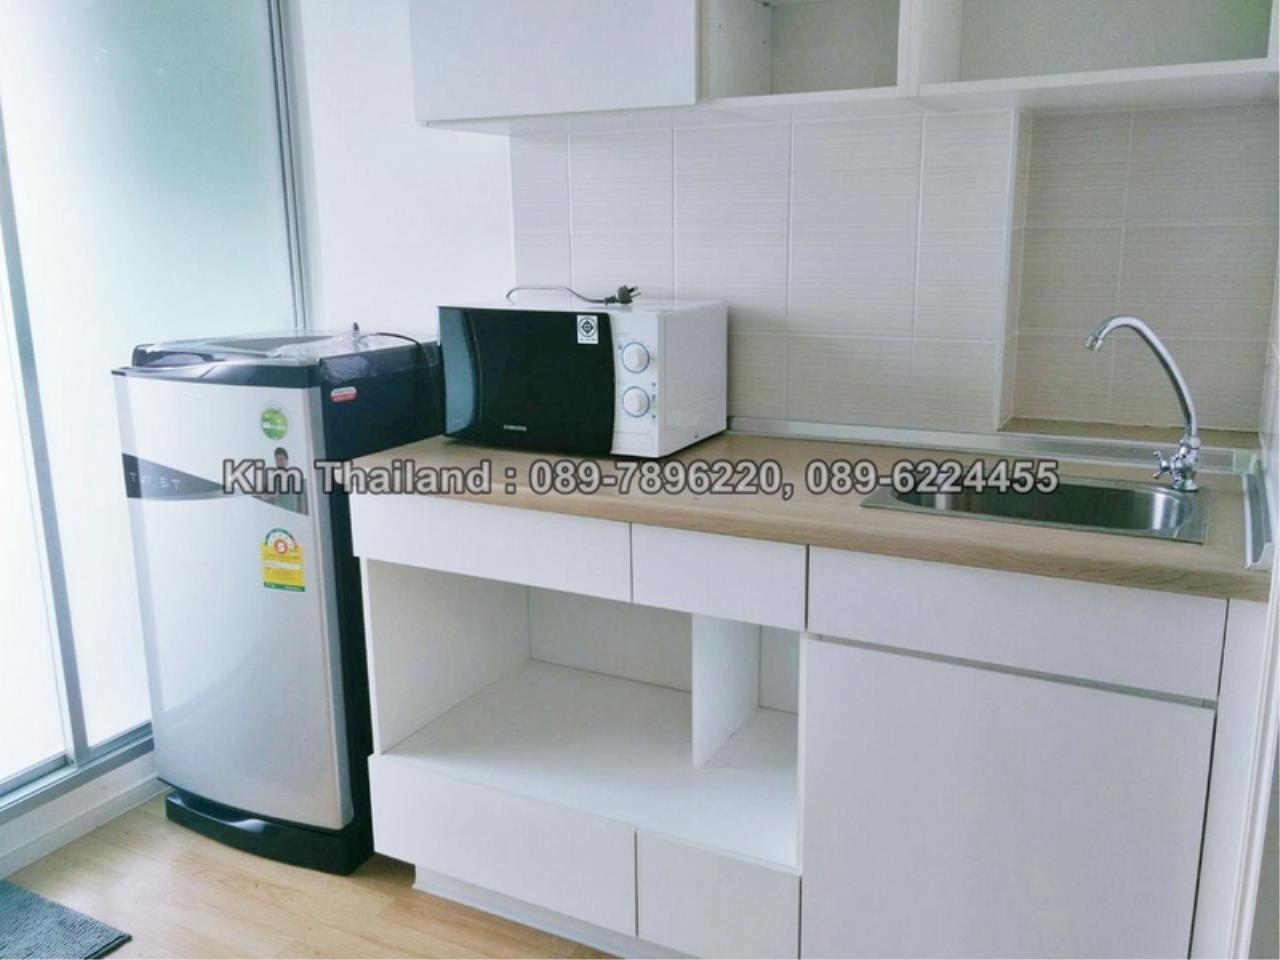 BKKcondorental Agency's For rent,Condo Lumpini Ville Prachachuen-Phongphet 2. Building B,  Area 26 sq.m.  3